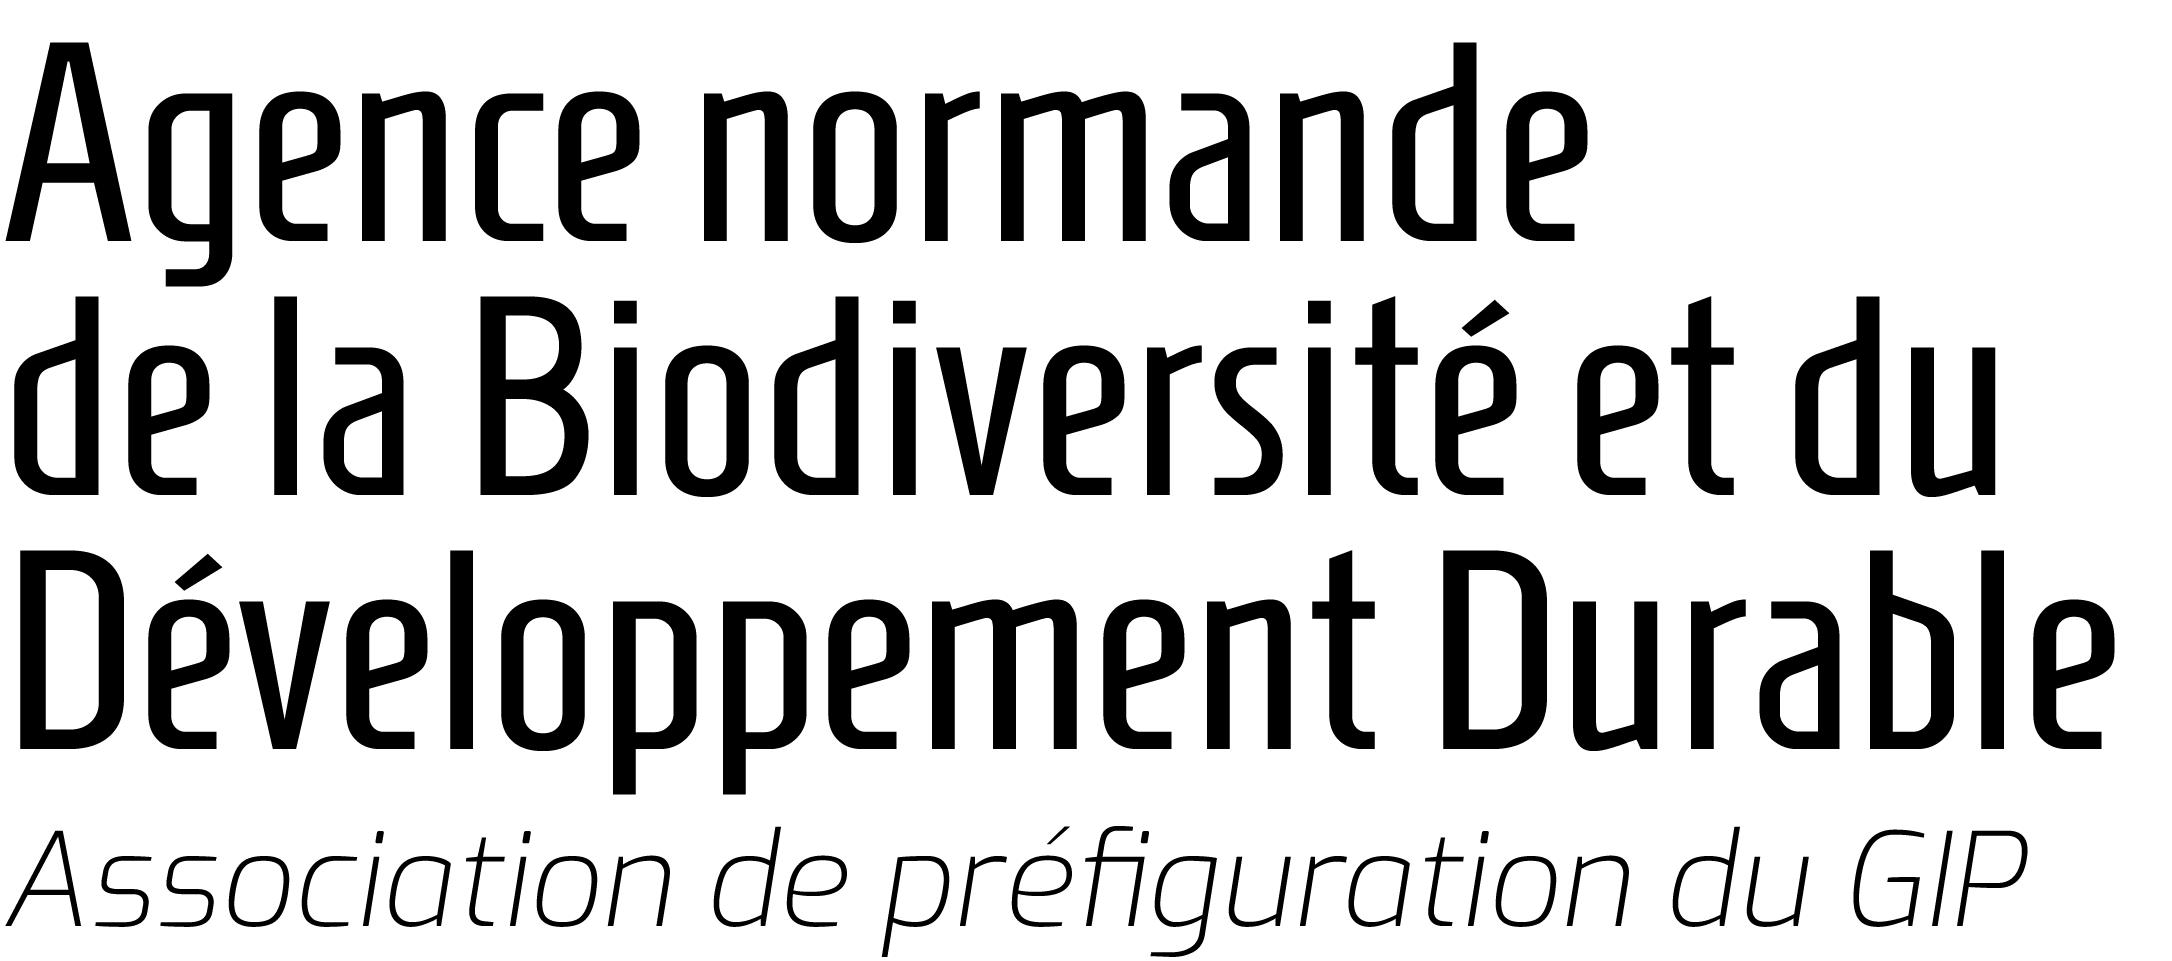 ASSOCIATION DE PREFIGURATION DU GIP